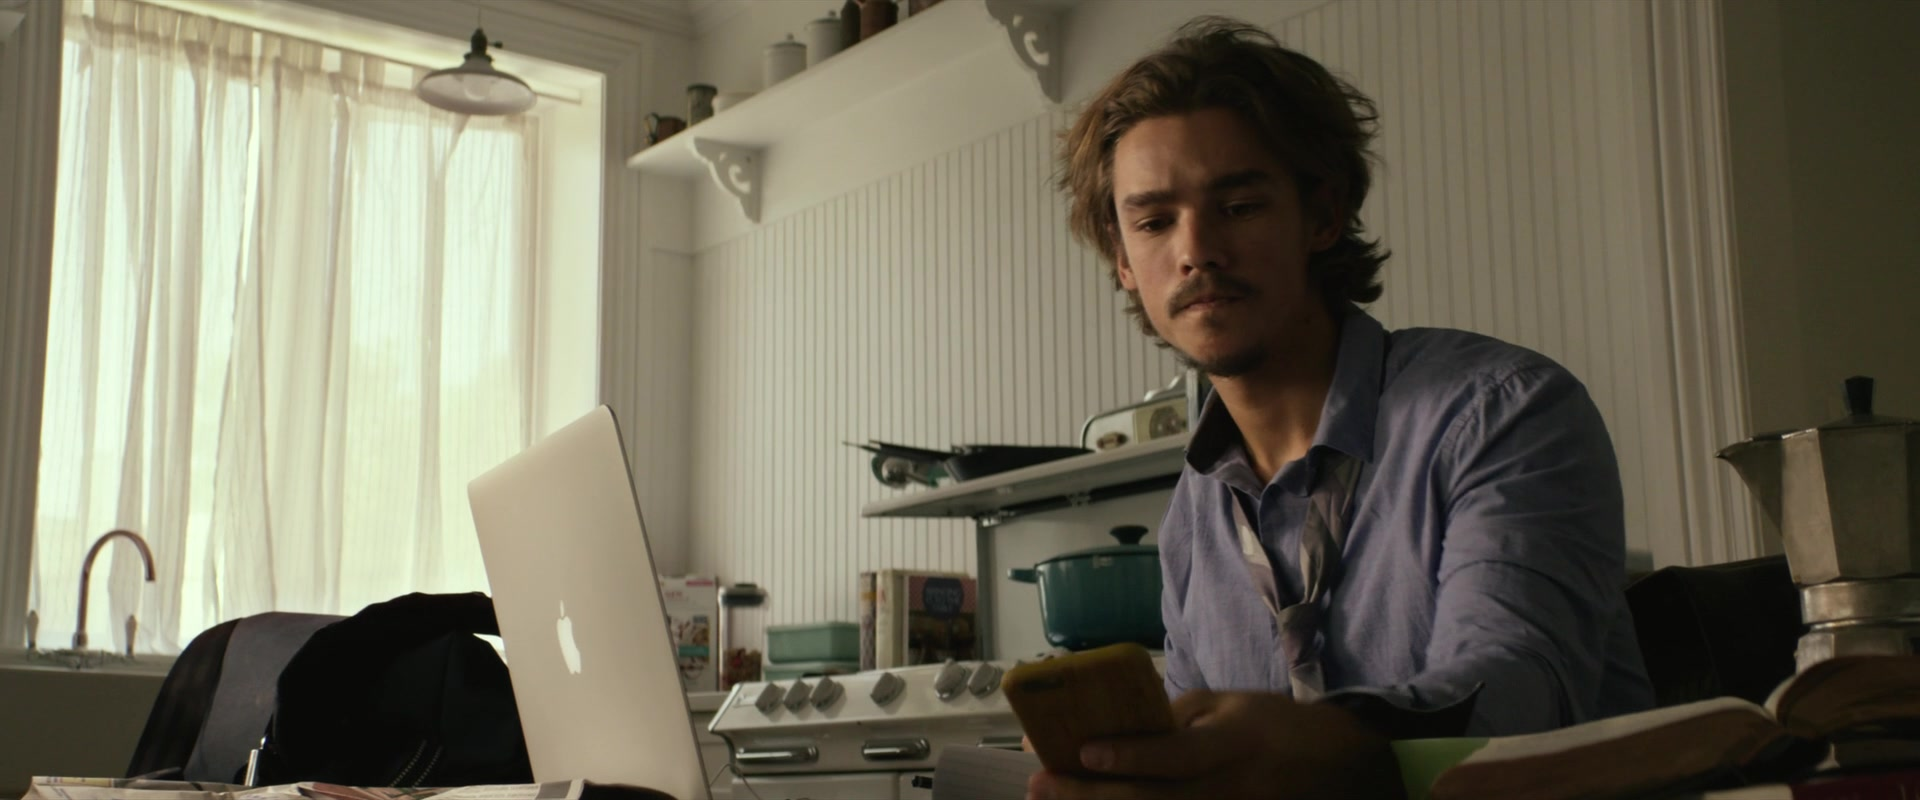 Apple Macbook Laptop Used By Brenton Thwaites In An